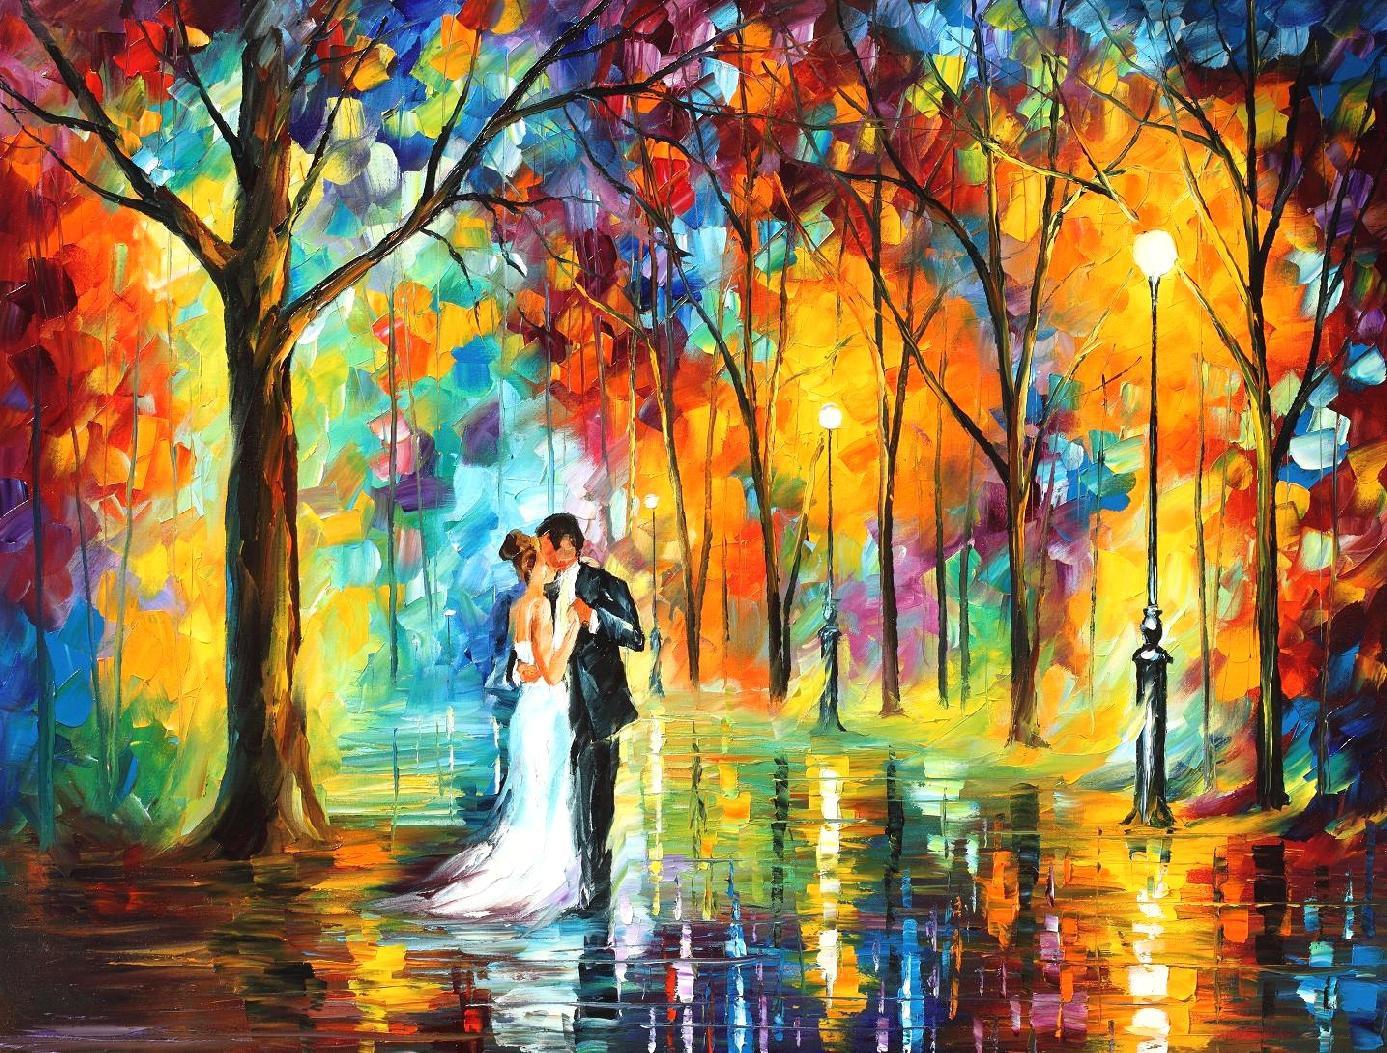 Wedding Anniversary Gift Rainy Wedding Oil Painting By Etsy